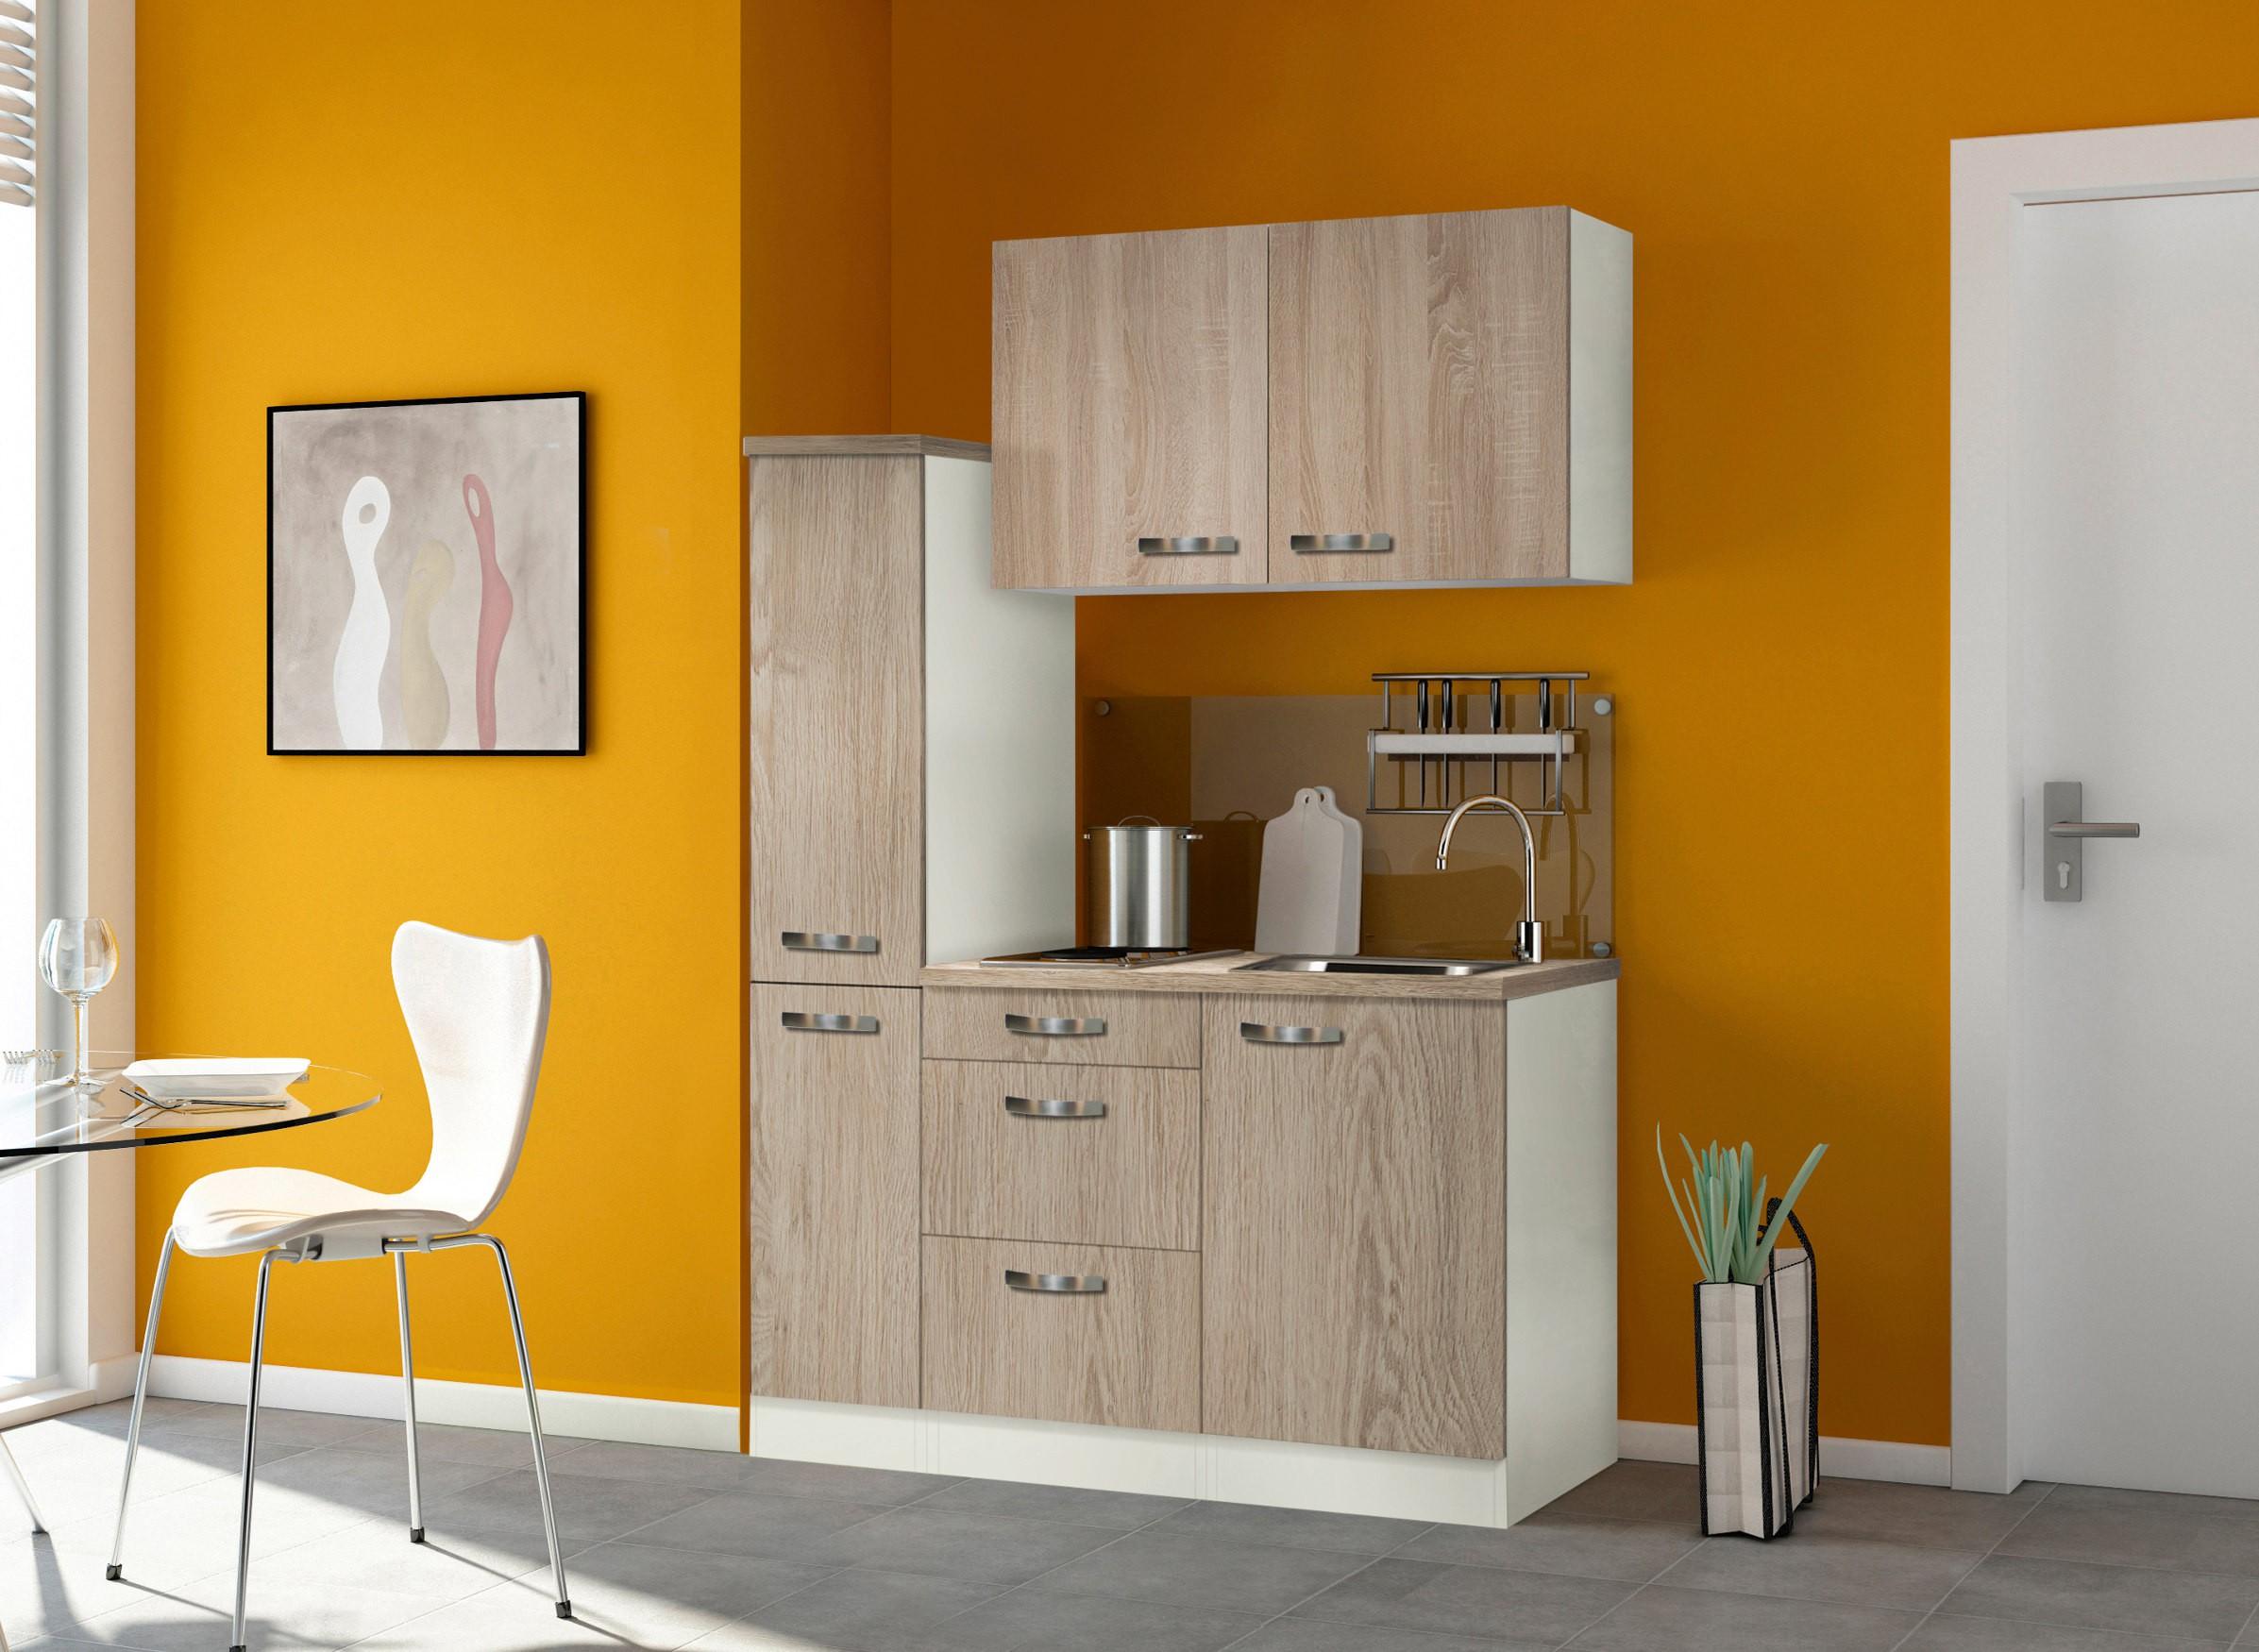 singlek che toledo mit elektro kochfeld breite 130 cm eiche s gerau k che singlek chen. Black Bedroom Furniture Sets. Home Design Ideas